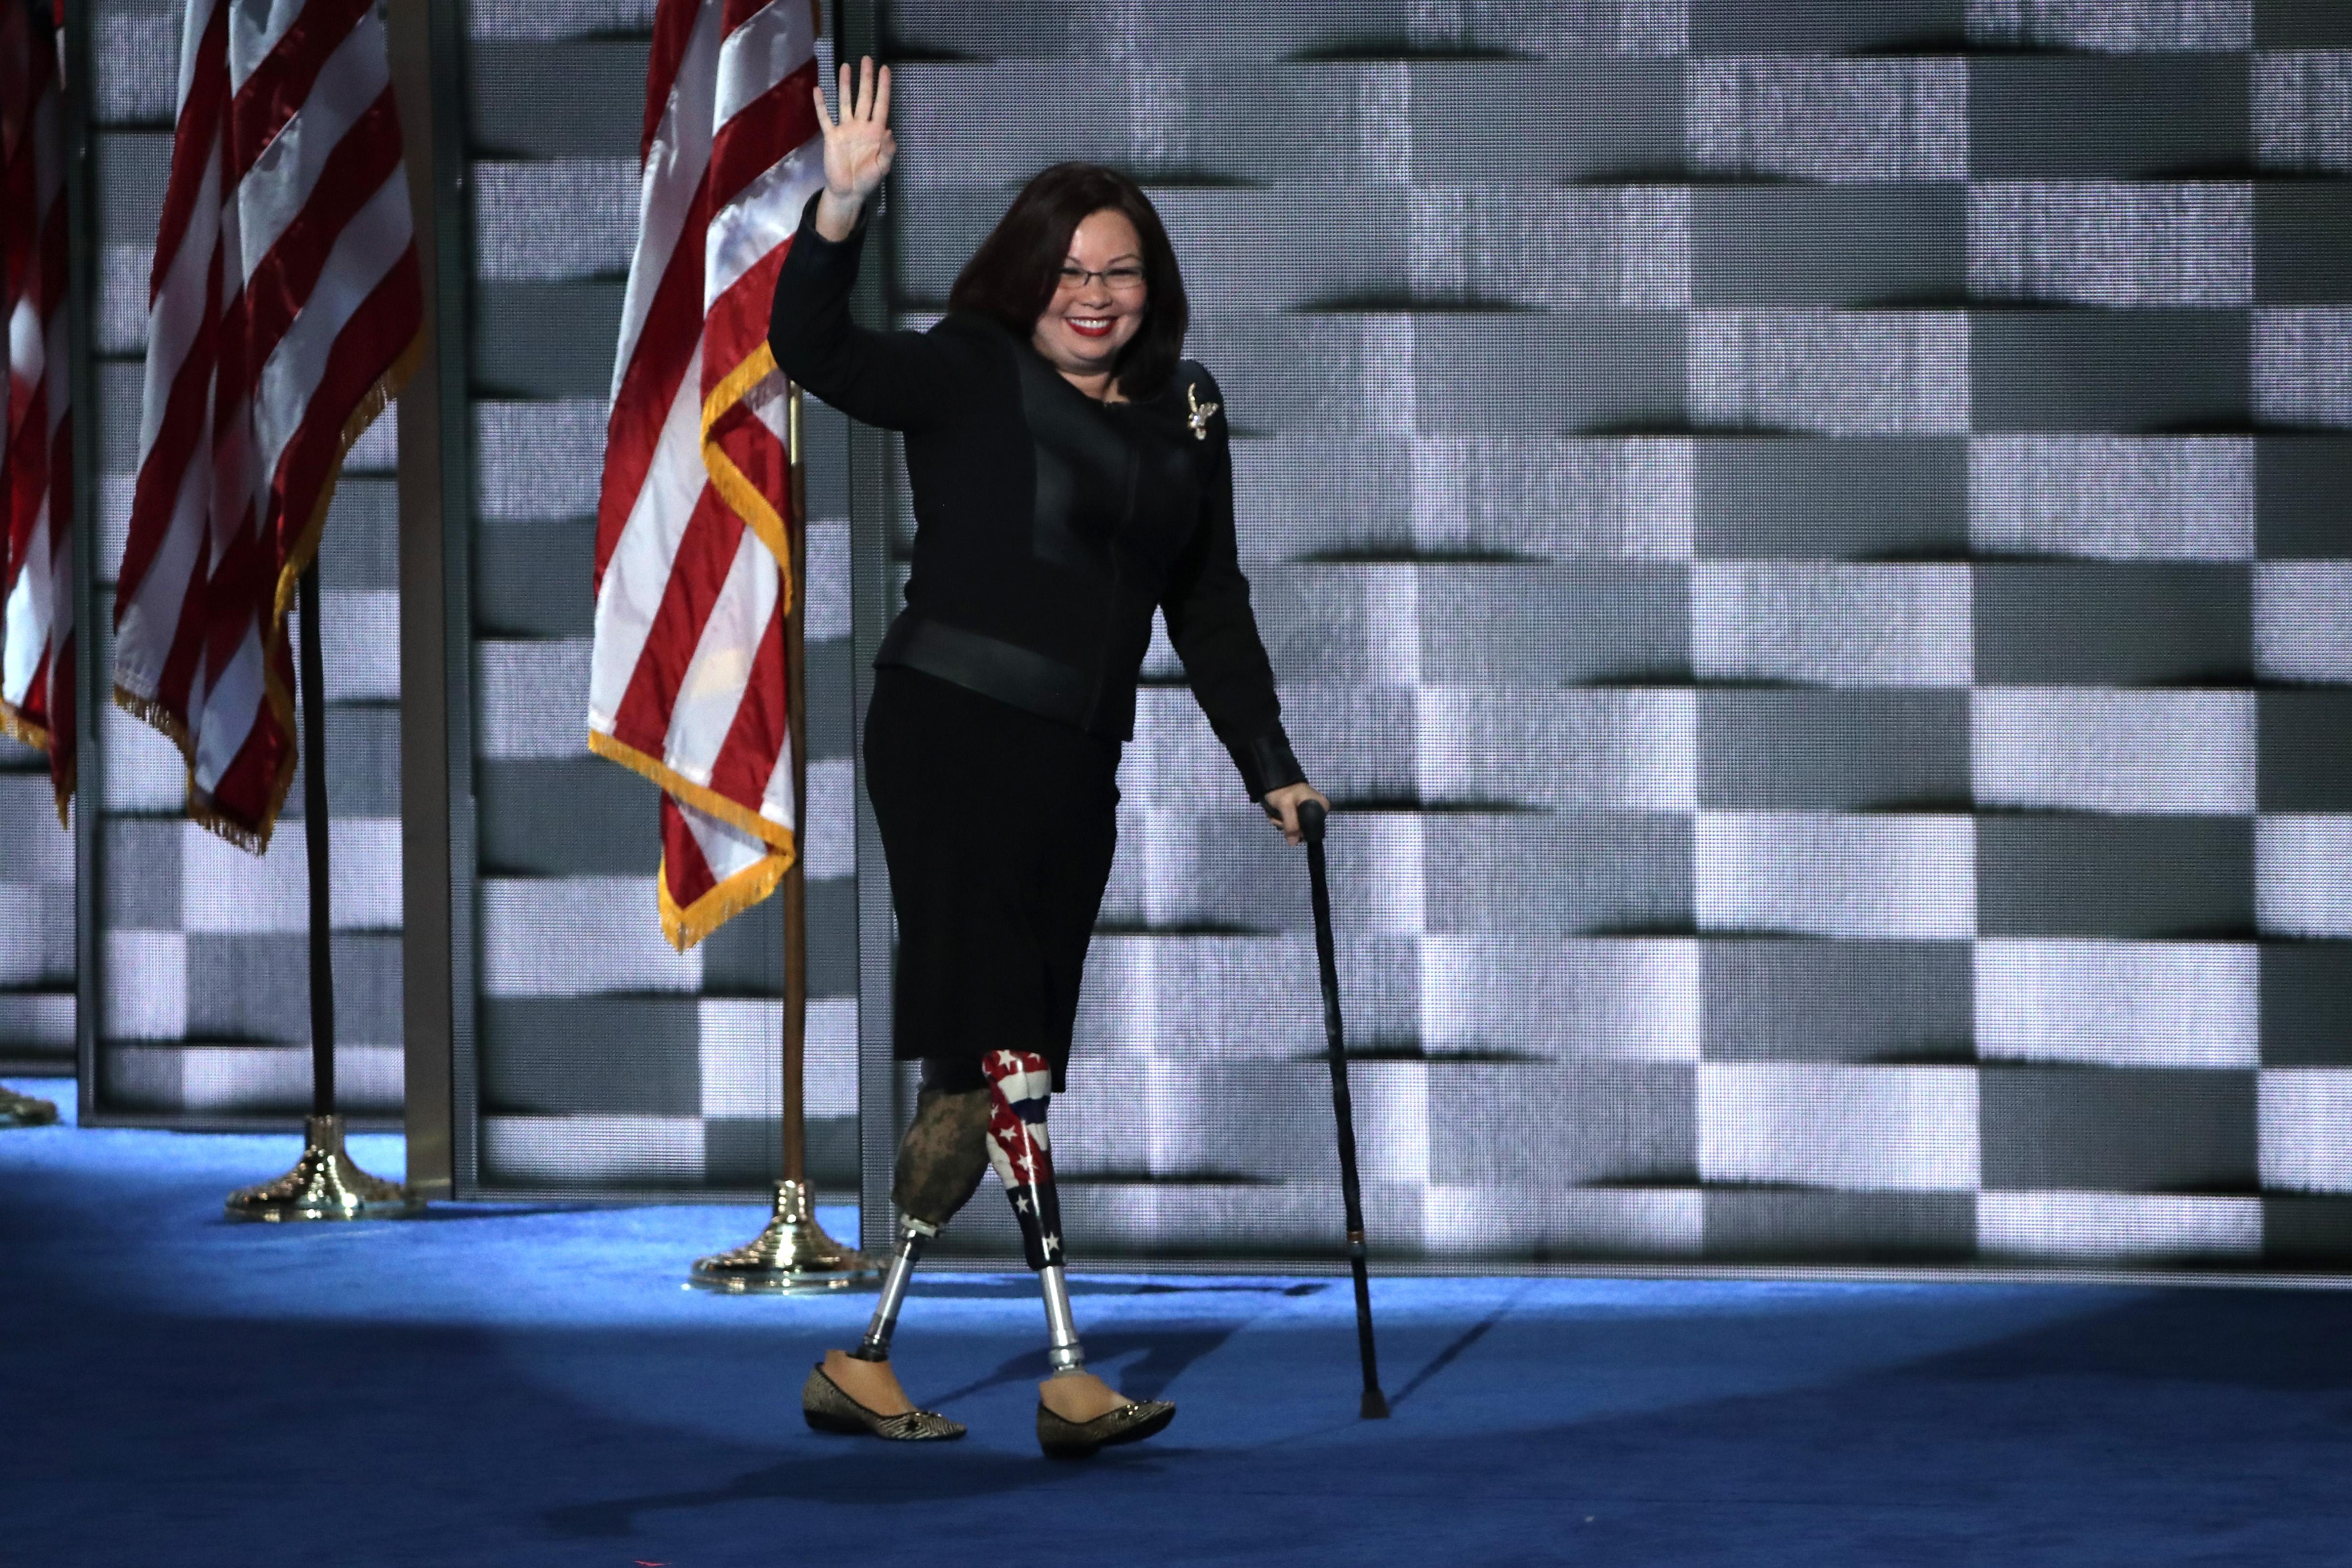 Tammy Duckworth walks across stage using prosthetic legs